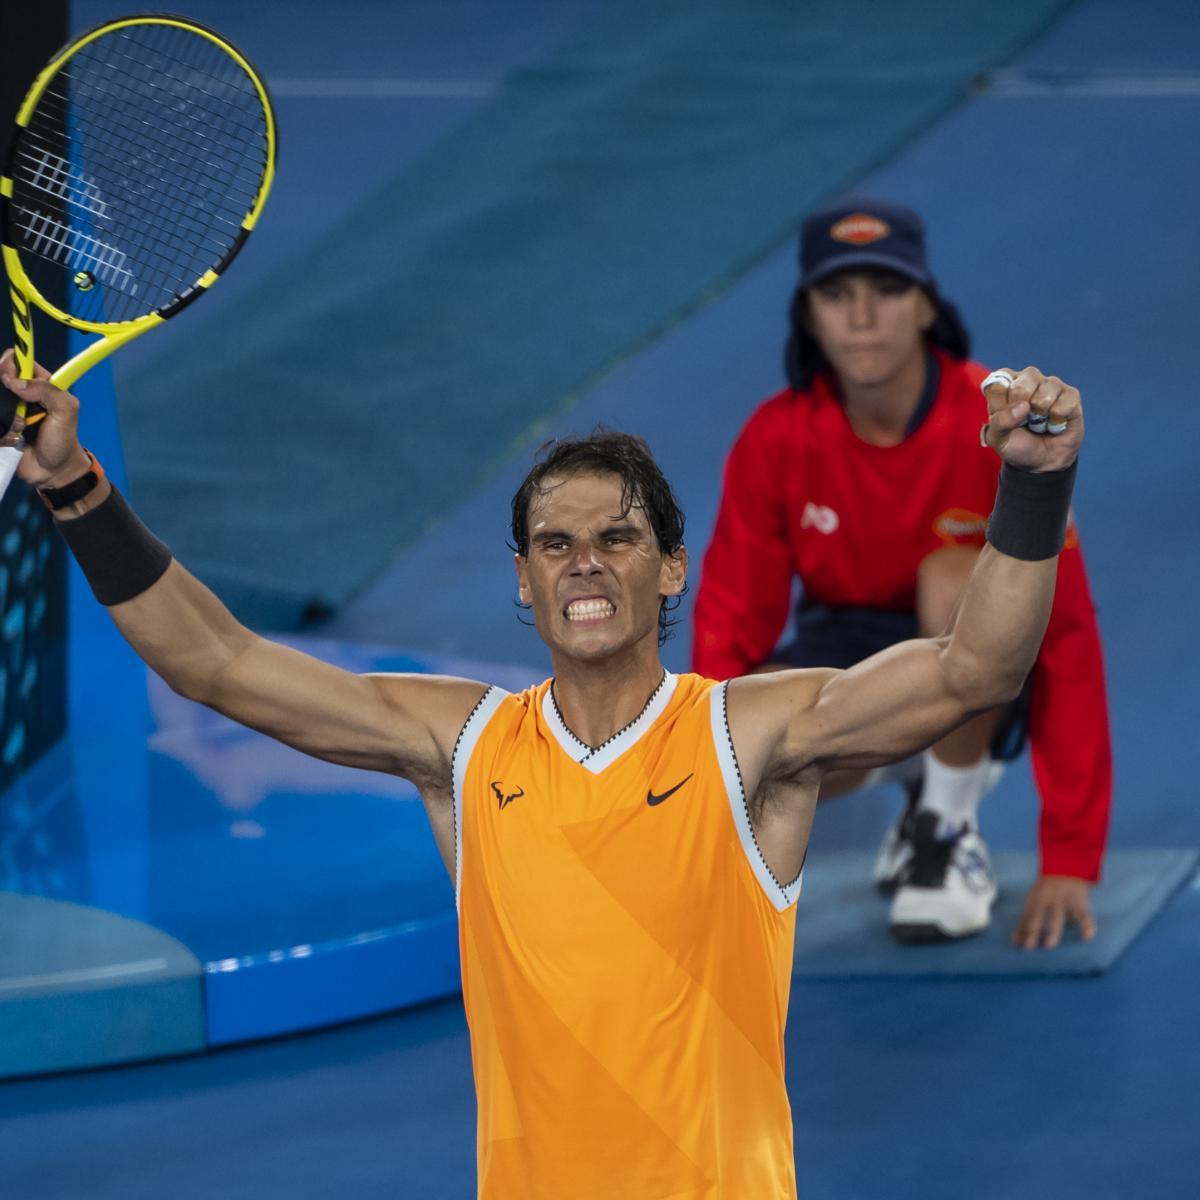 Australian Open 2019 Men's Semifinal: TV Schedule, Start